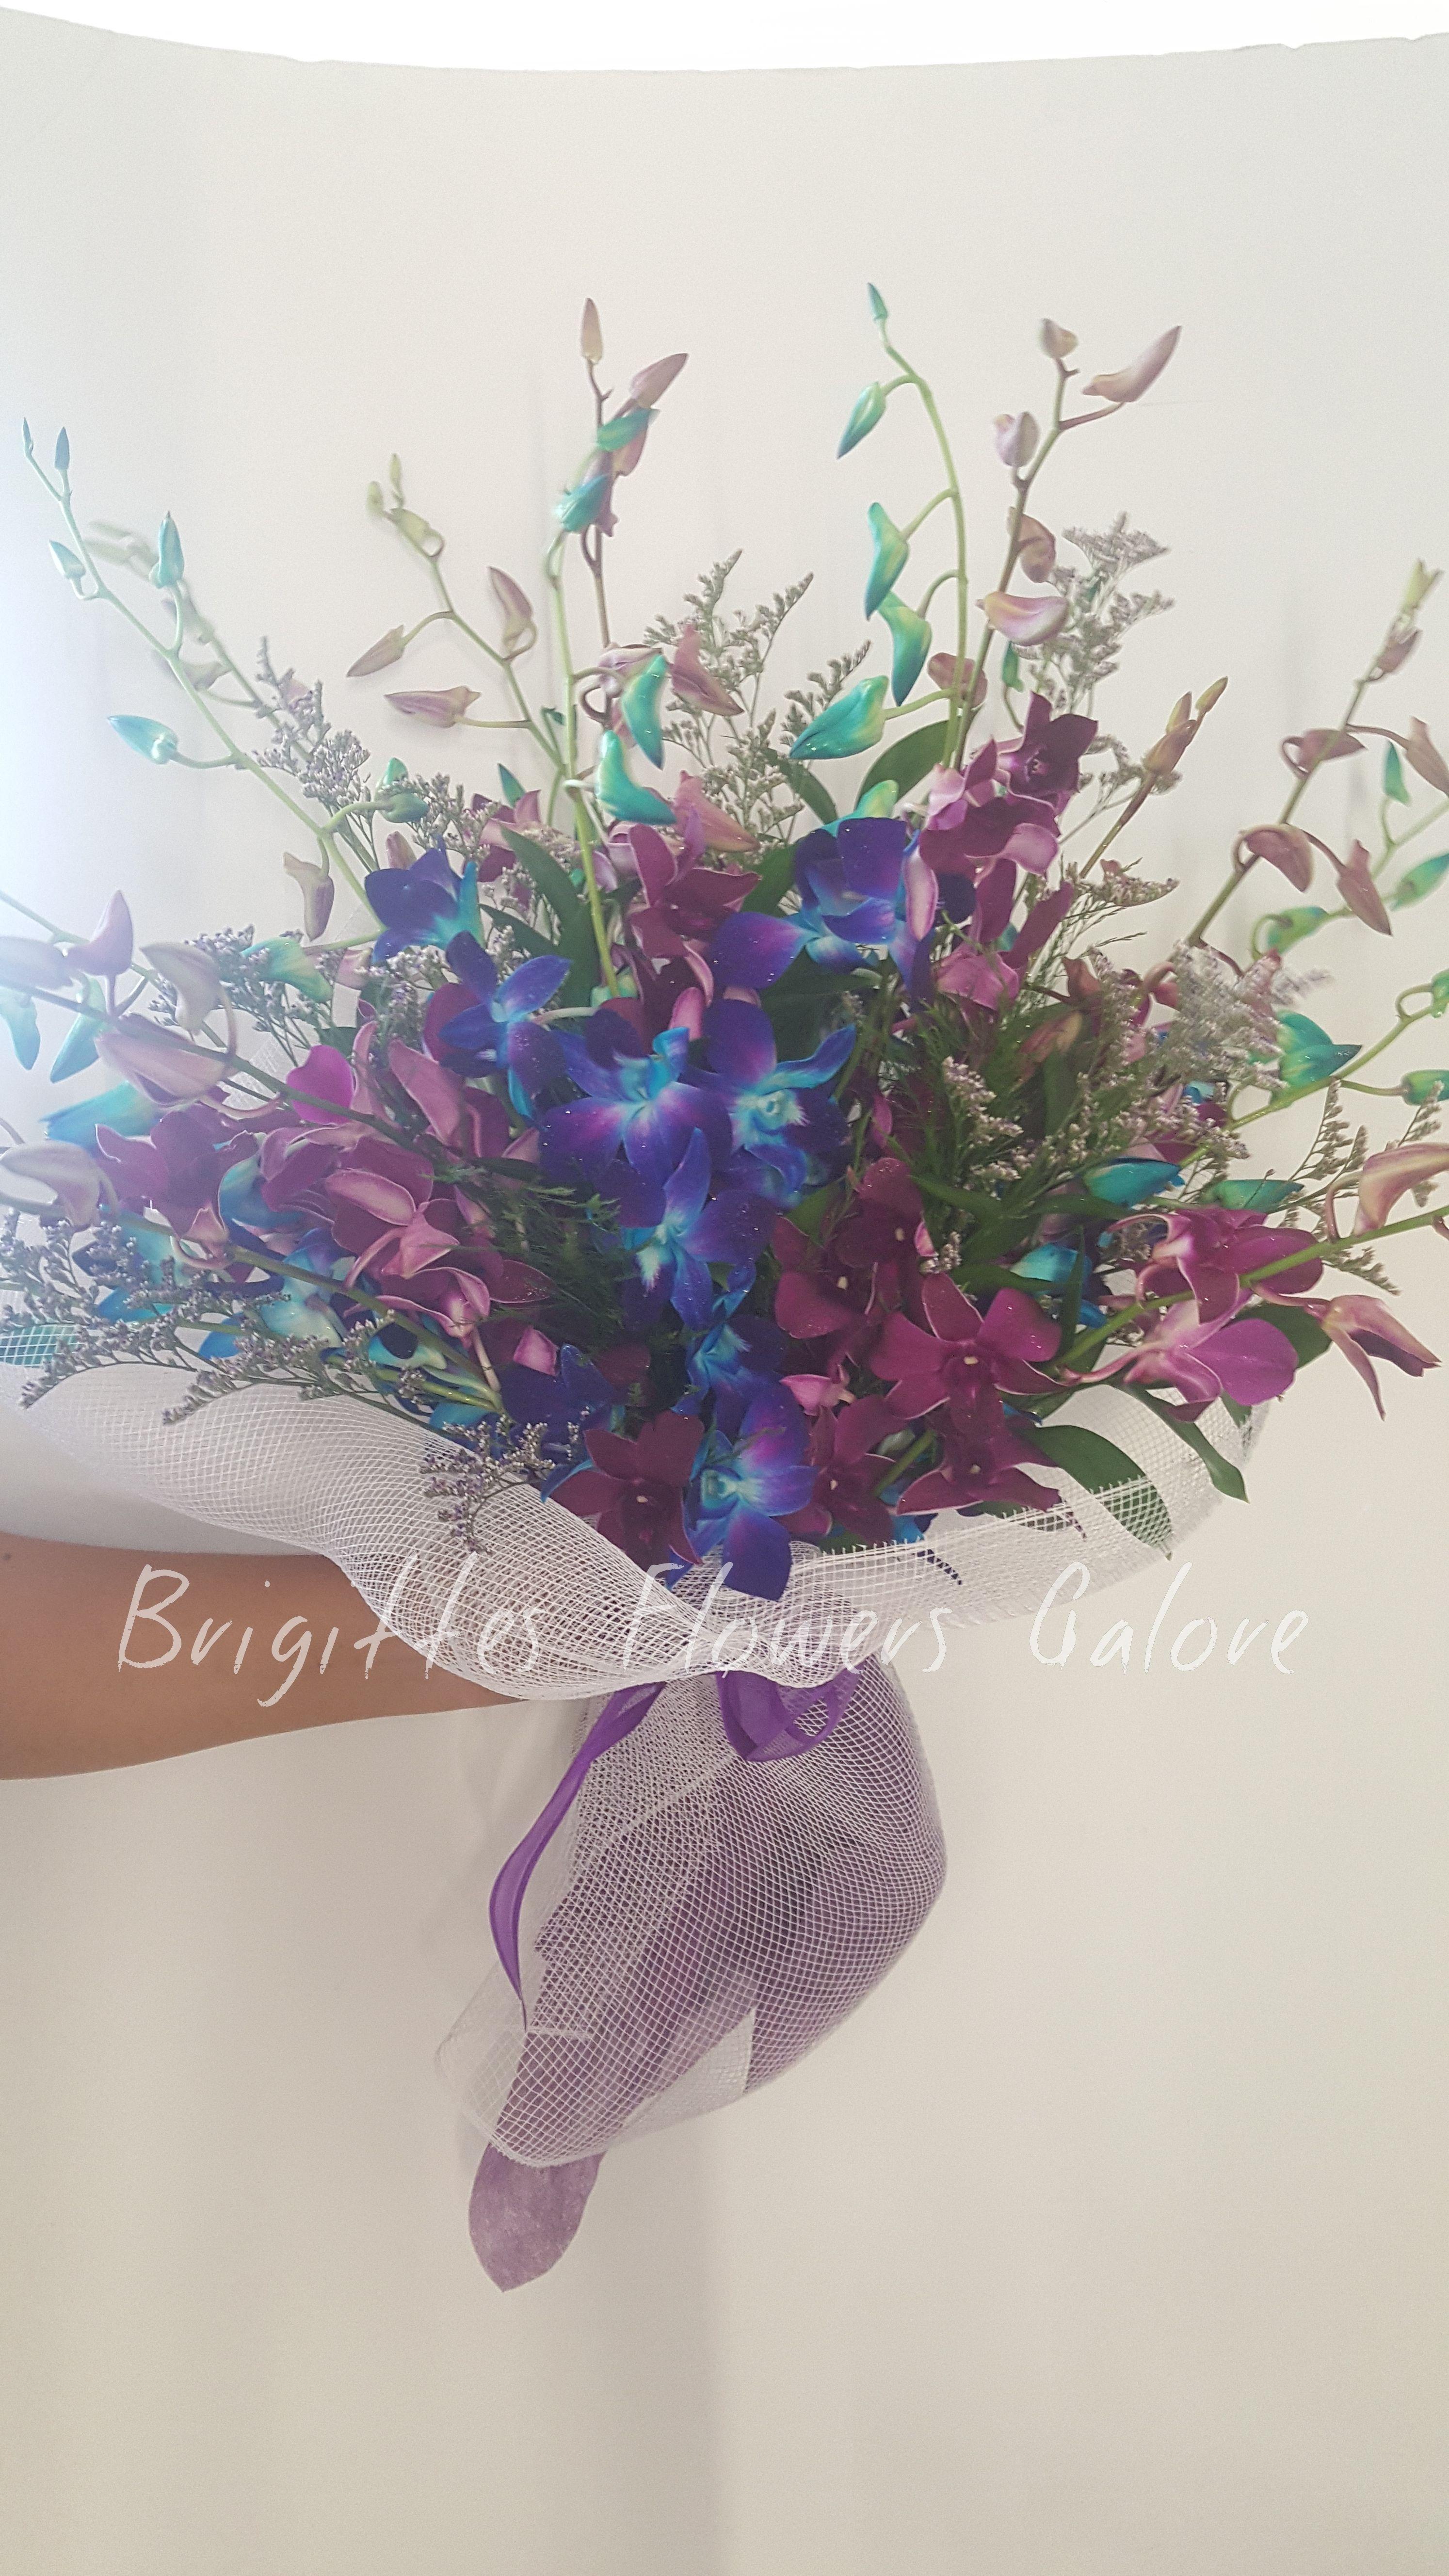 Pin By Brigitte S Flowers Galore On Variety Of Fl Designs Bfg Pinterest Fort Lauderdale